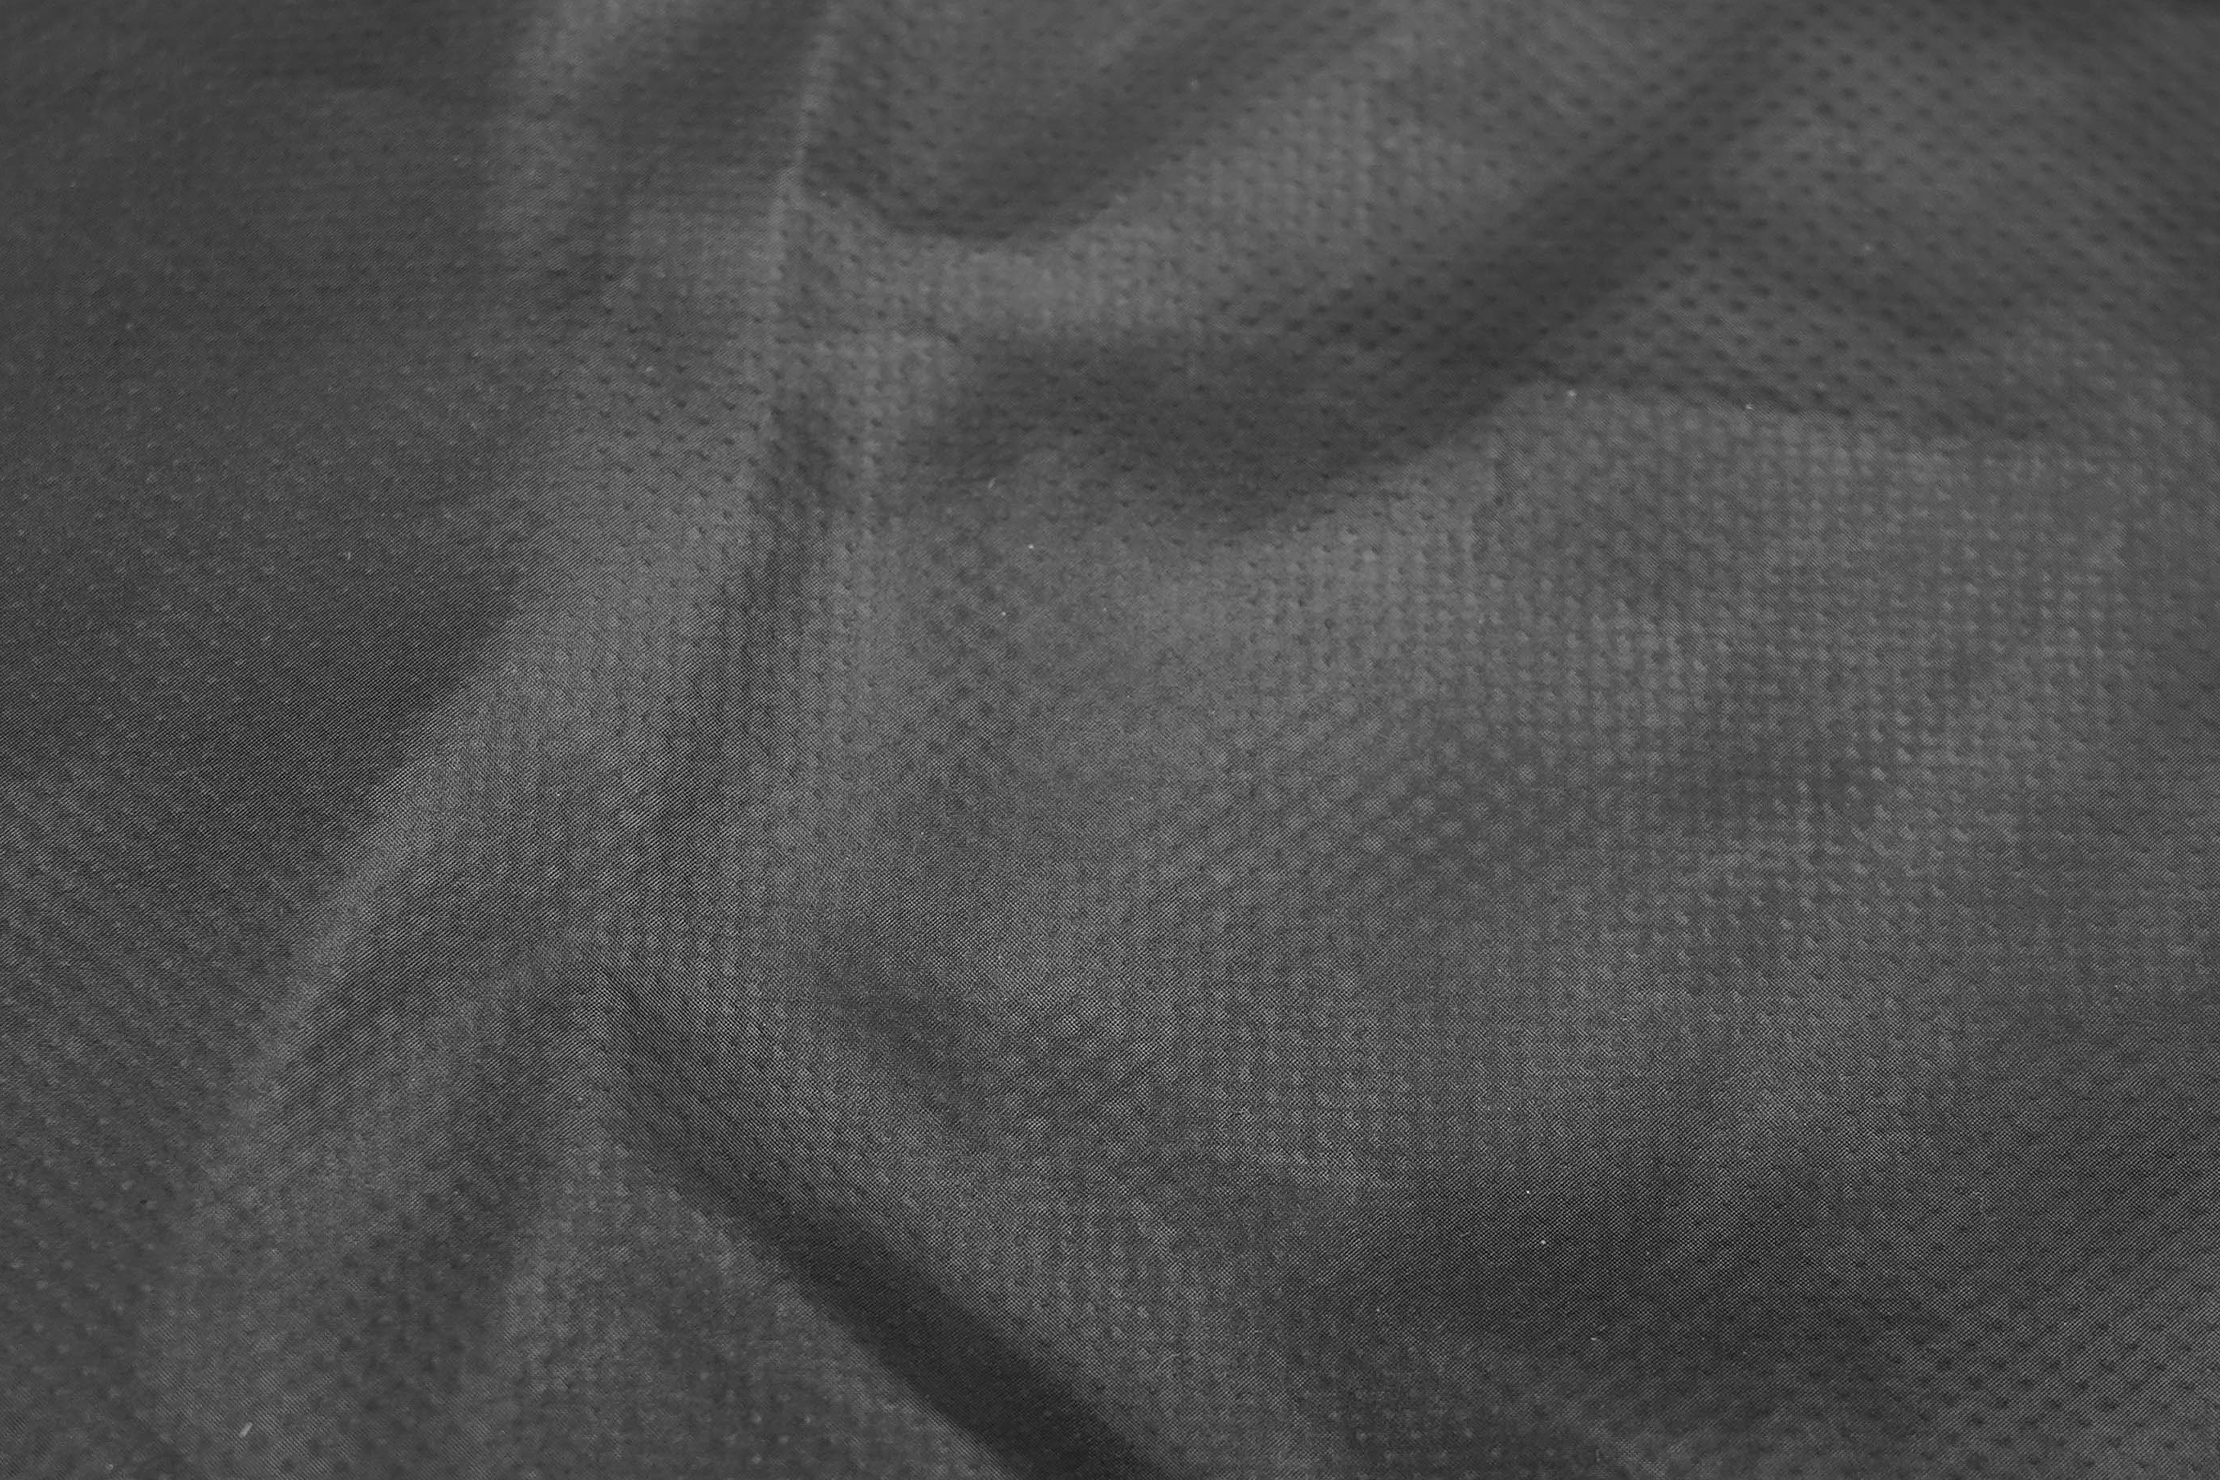 Cotopaxi Allpa 42L TPU Material